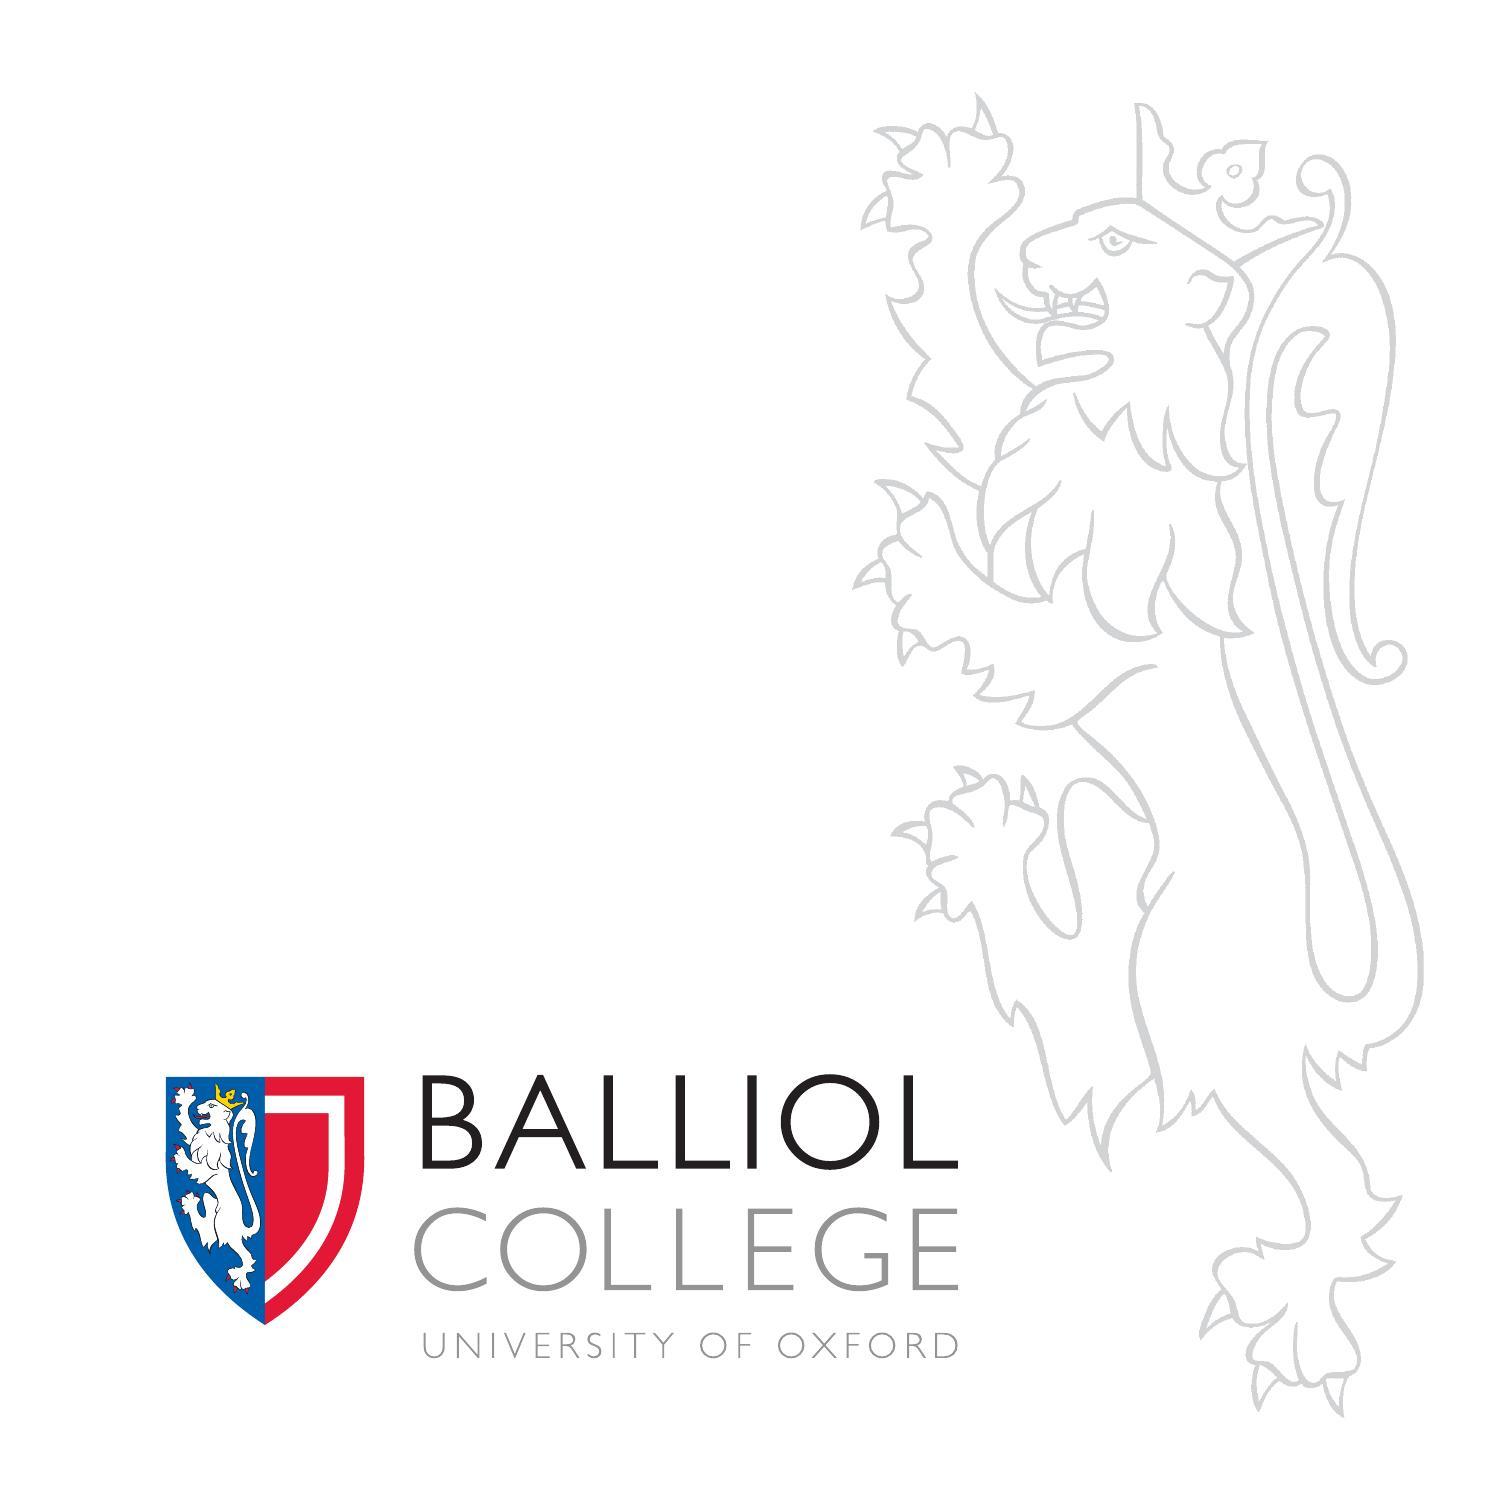 Balliol College undergraduate prospectus by Balliol